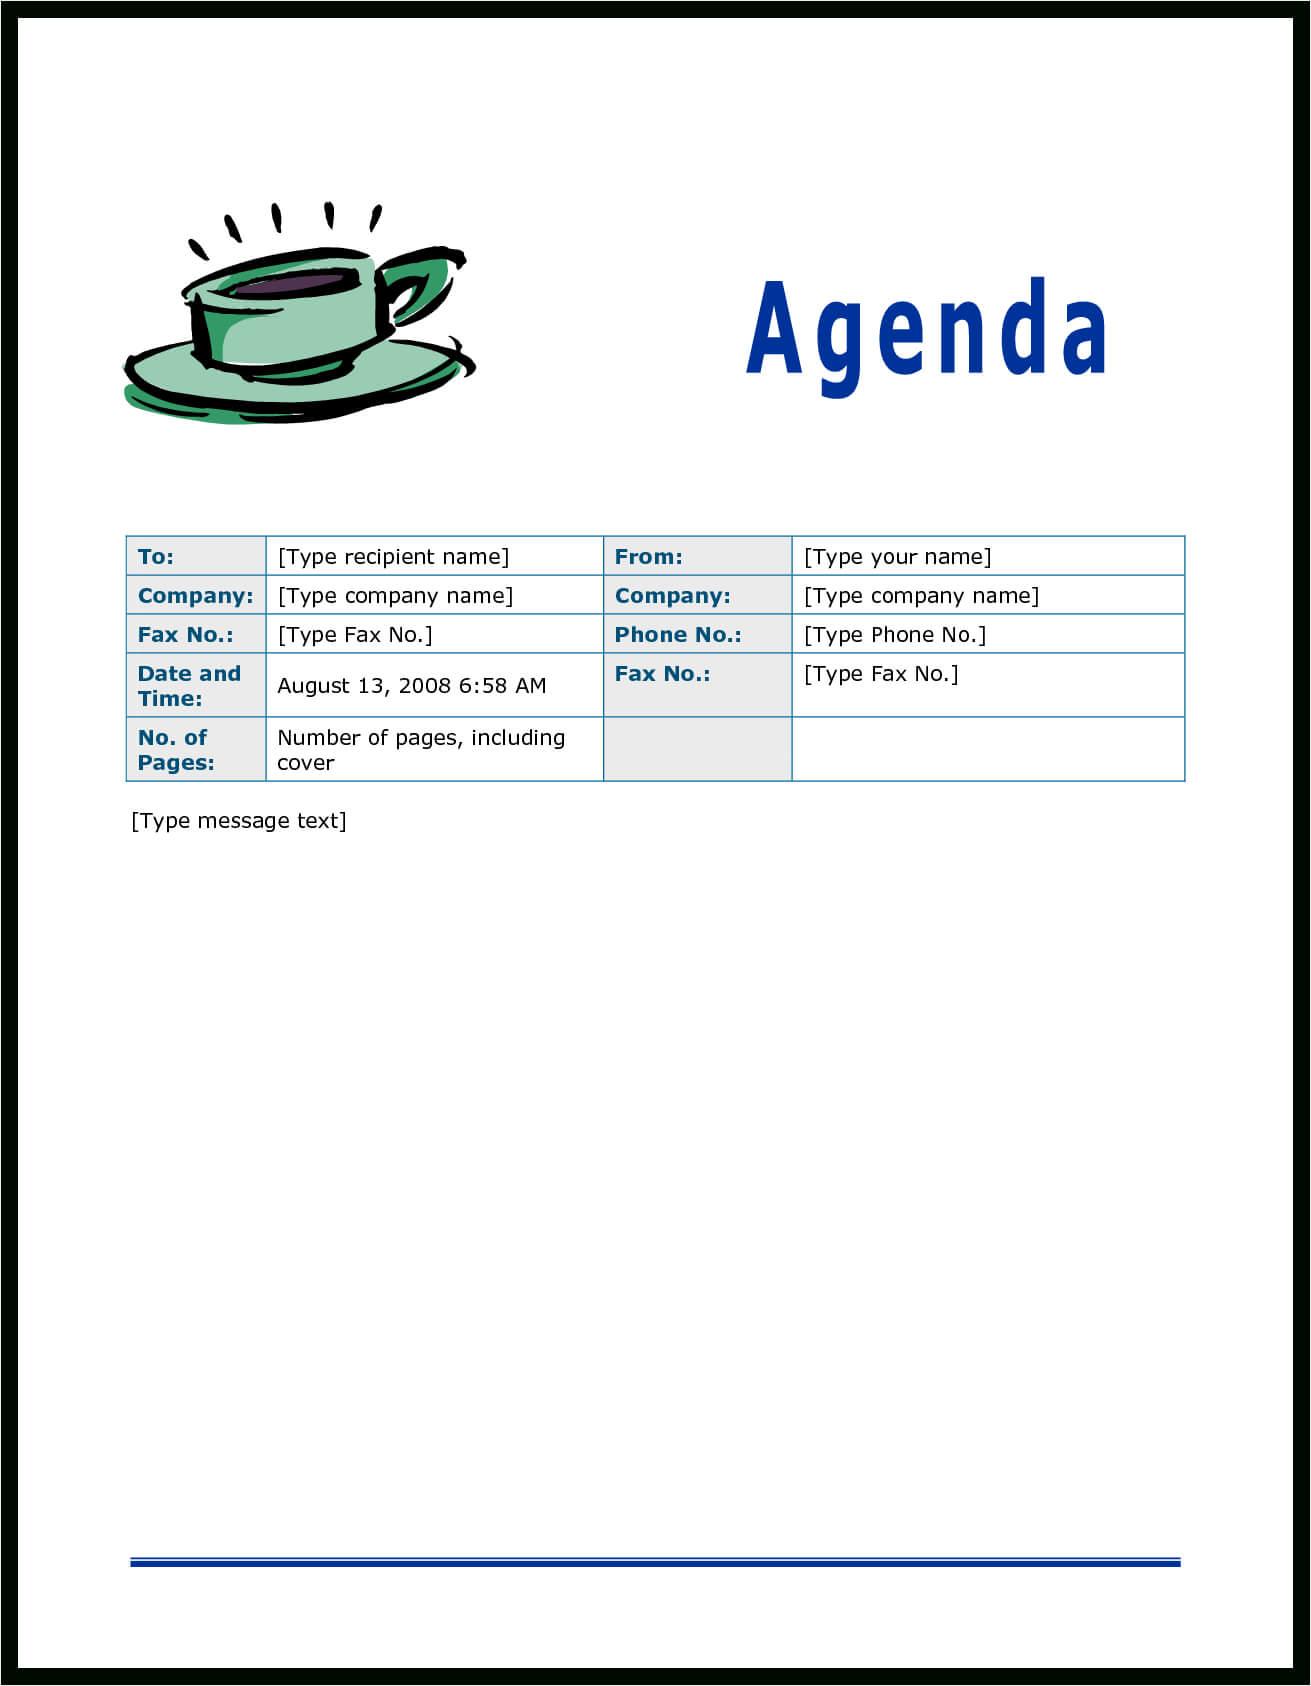 Event Program Agenda Template Word #4405 pertaining to Event Agenda Template Word